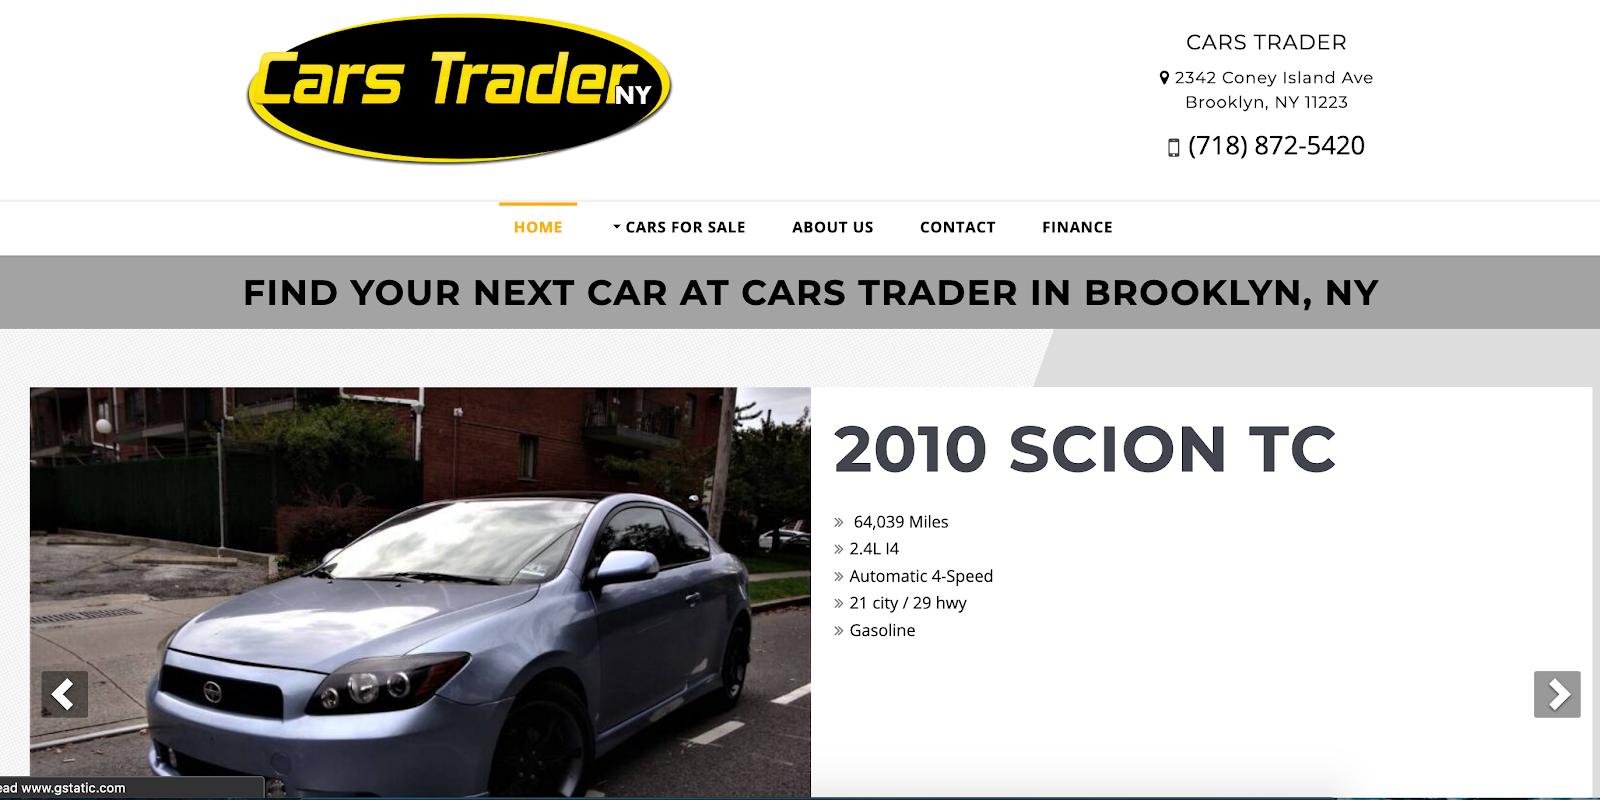 Photo of Cars Trader NY webpage